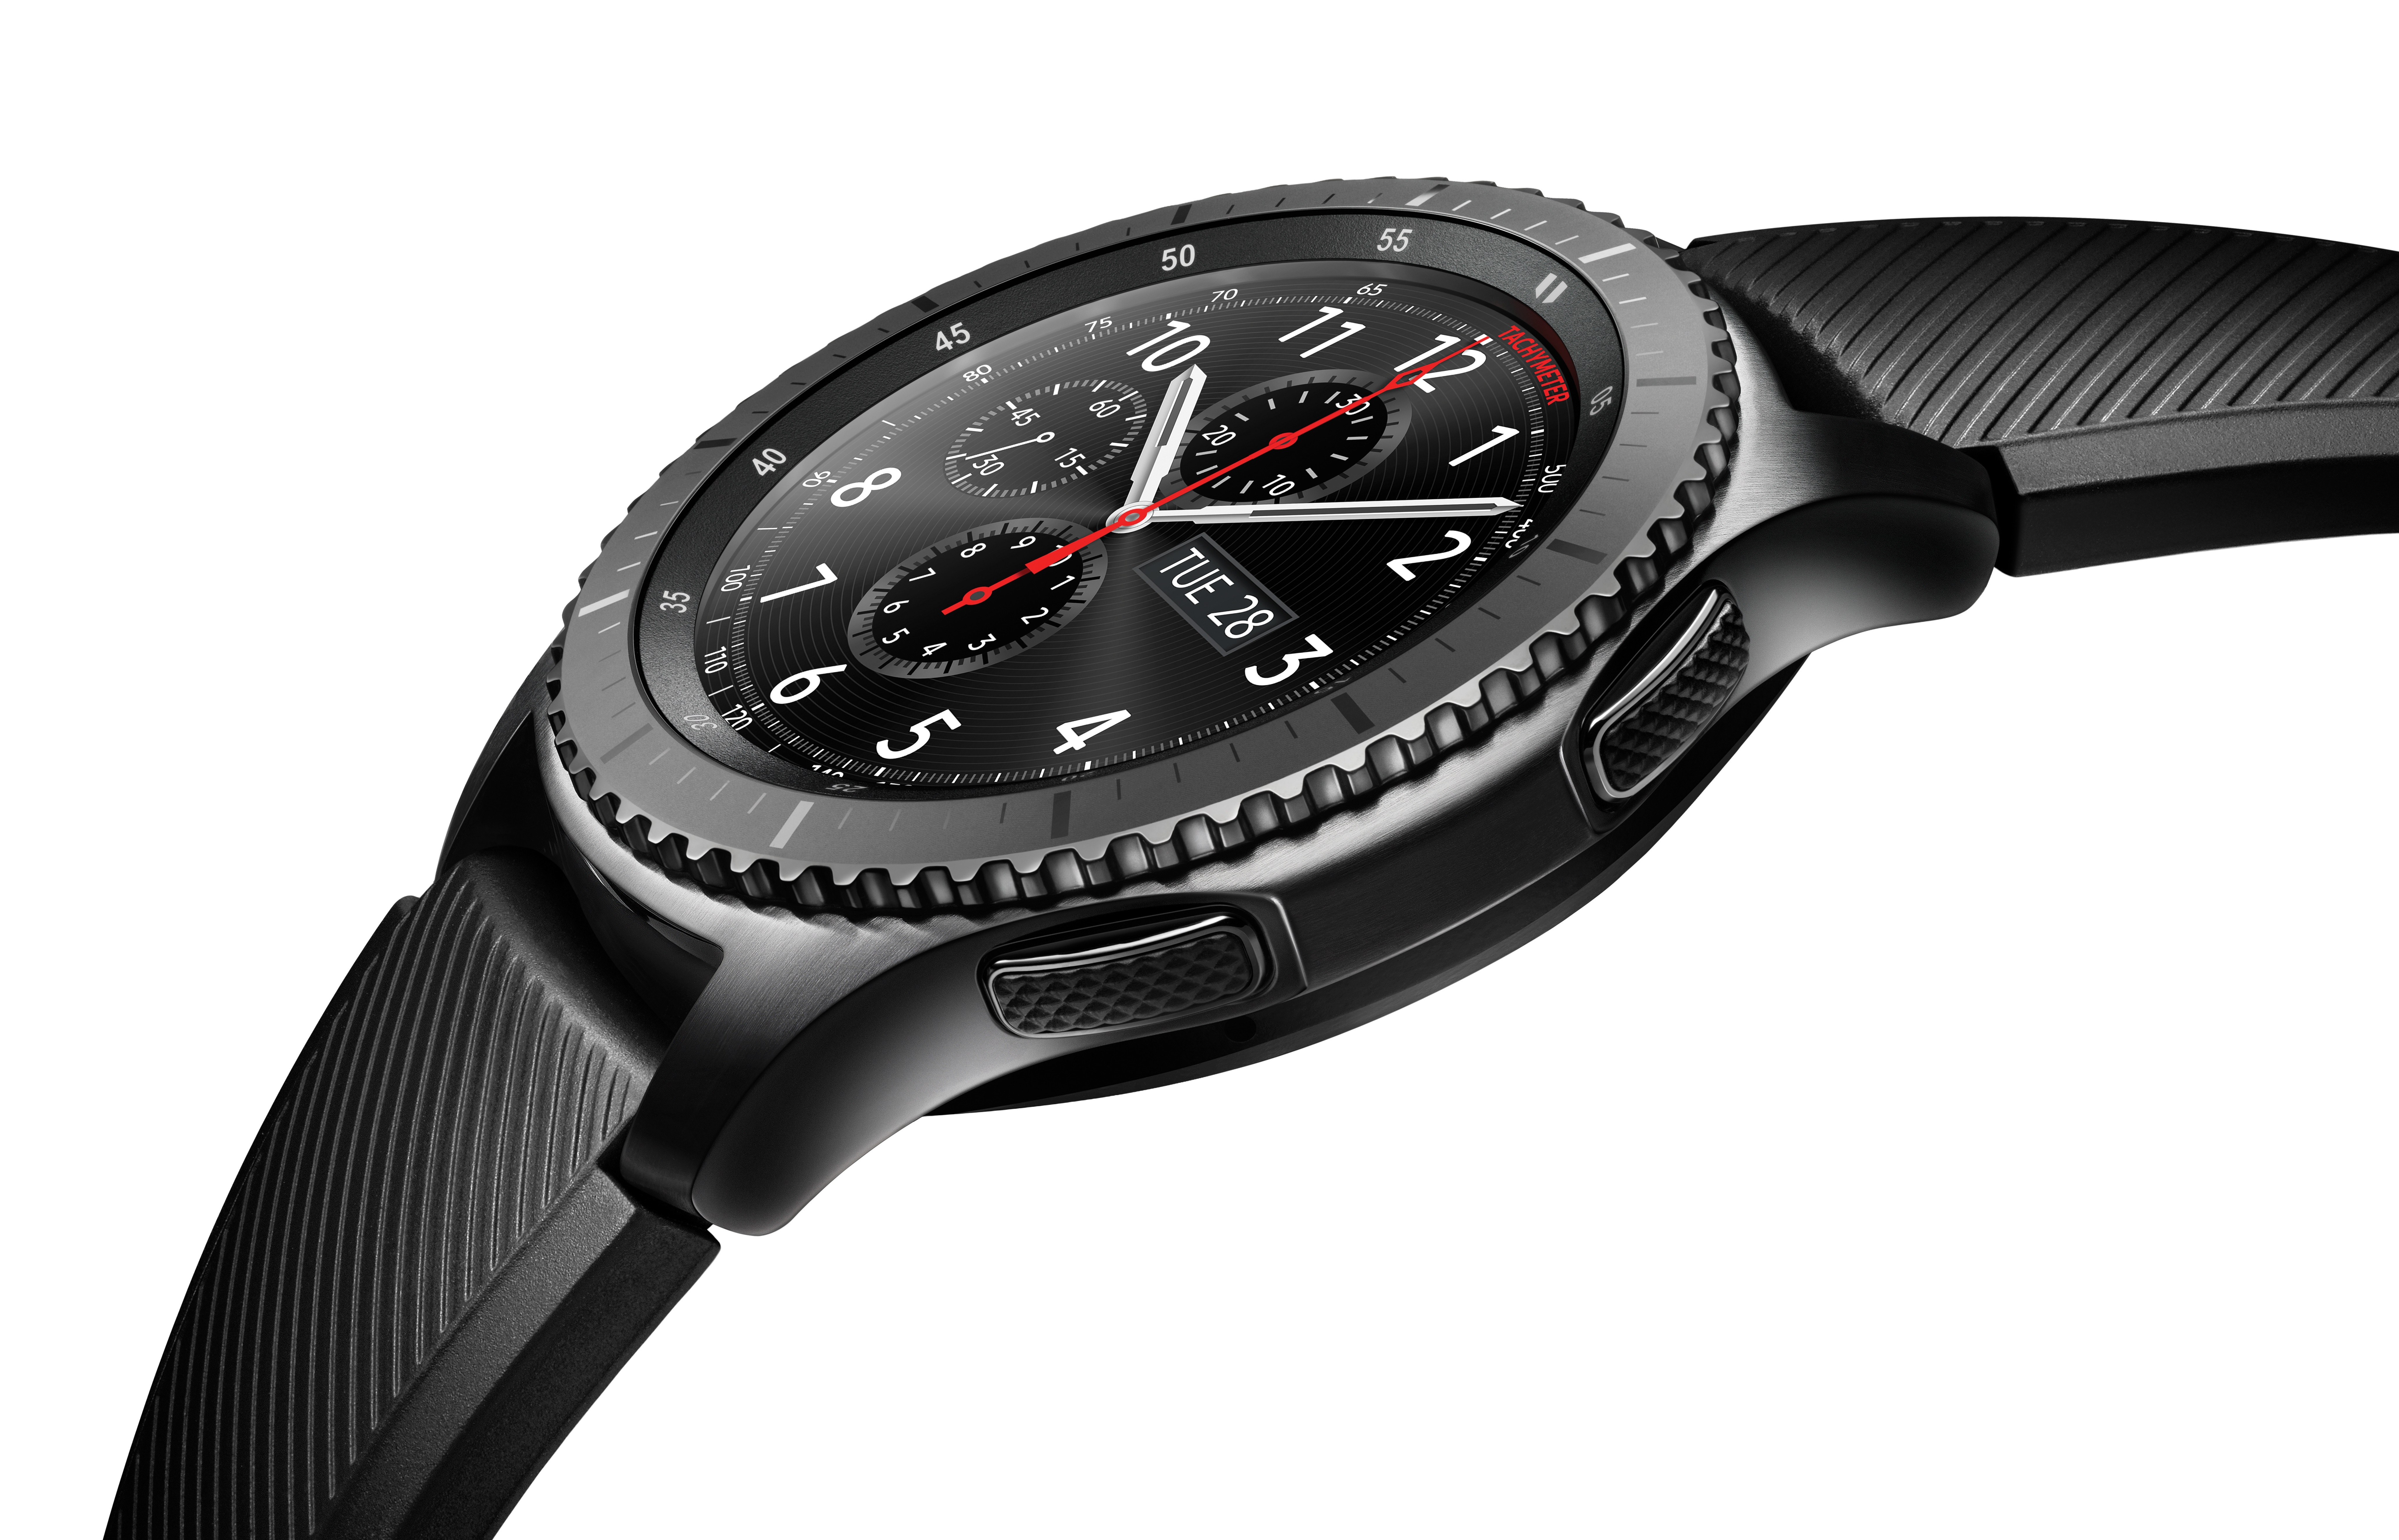 ADDING MULTIMEDIA Samsung Gear S3 Smartwatch Blends ...